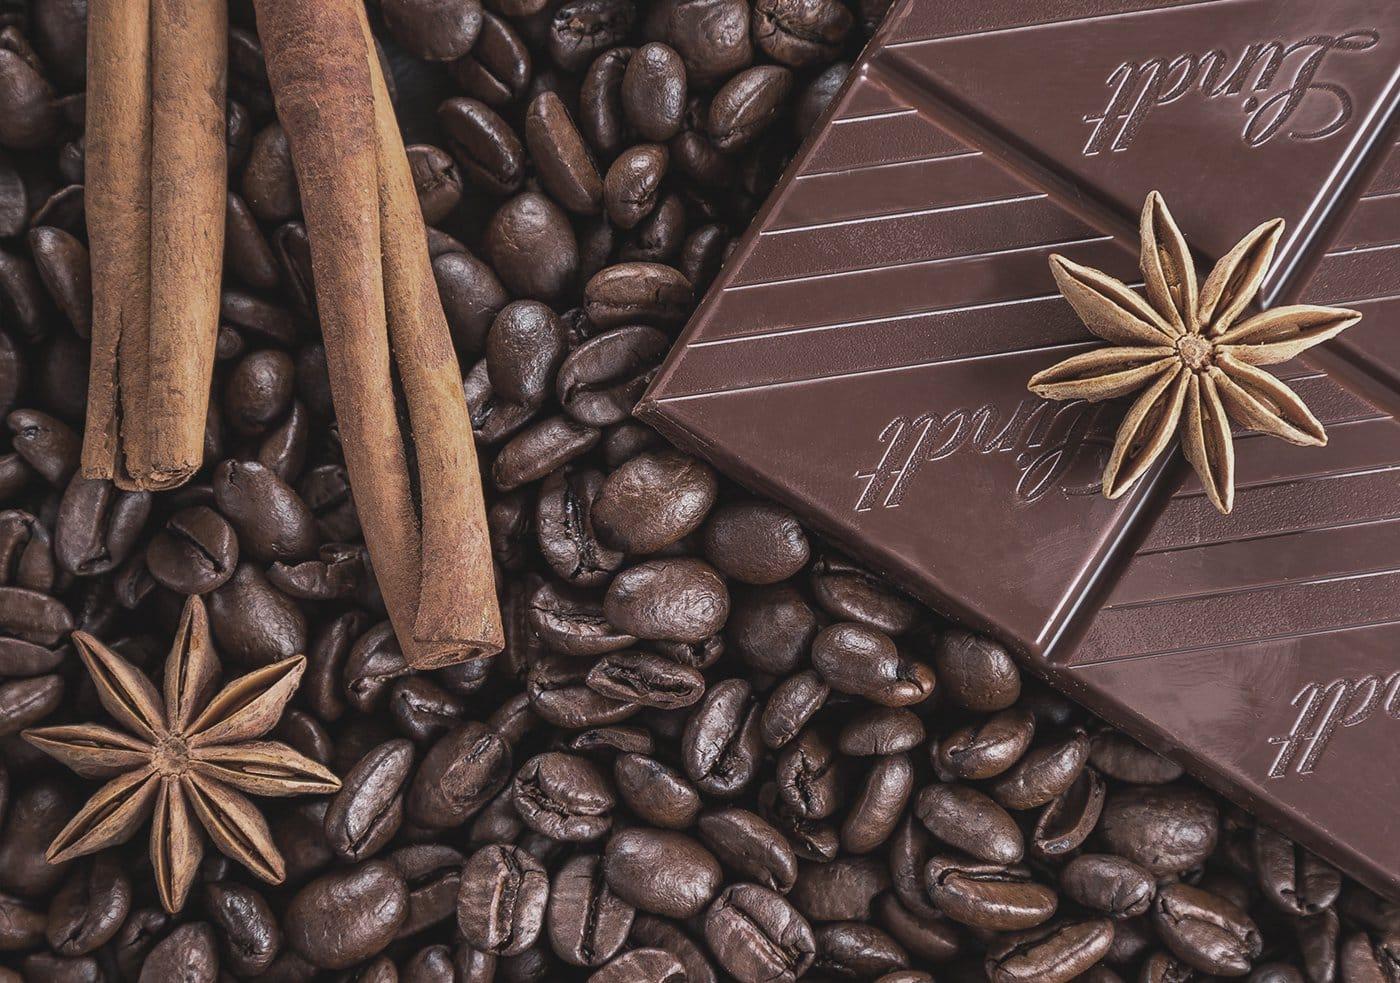 Caffeine & Health